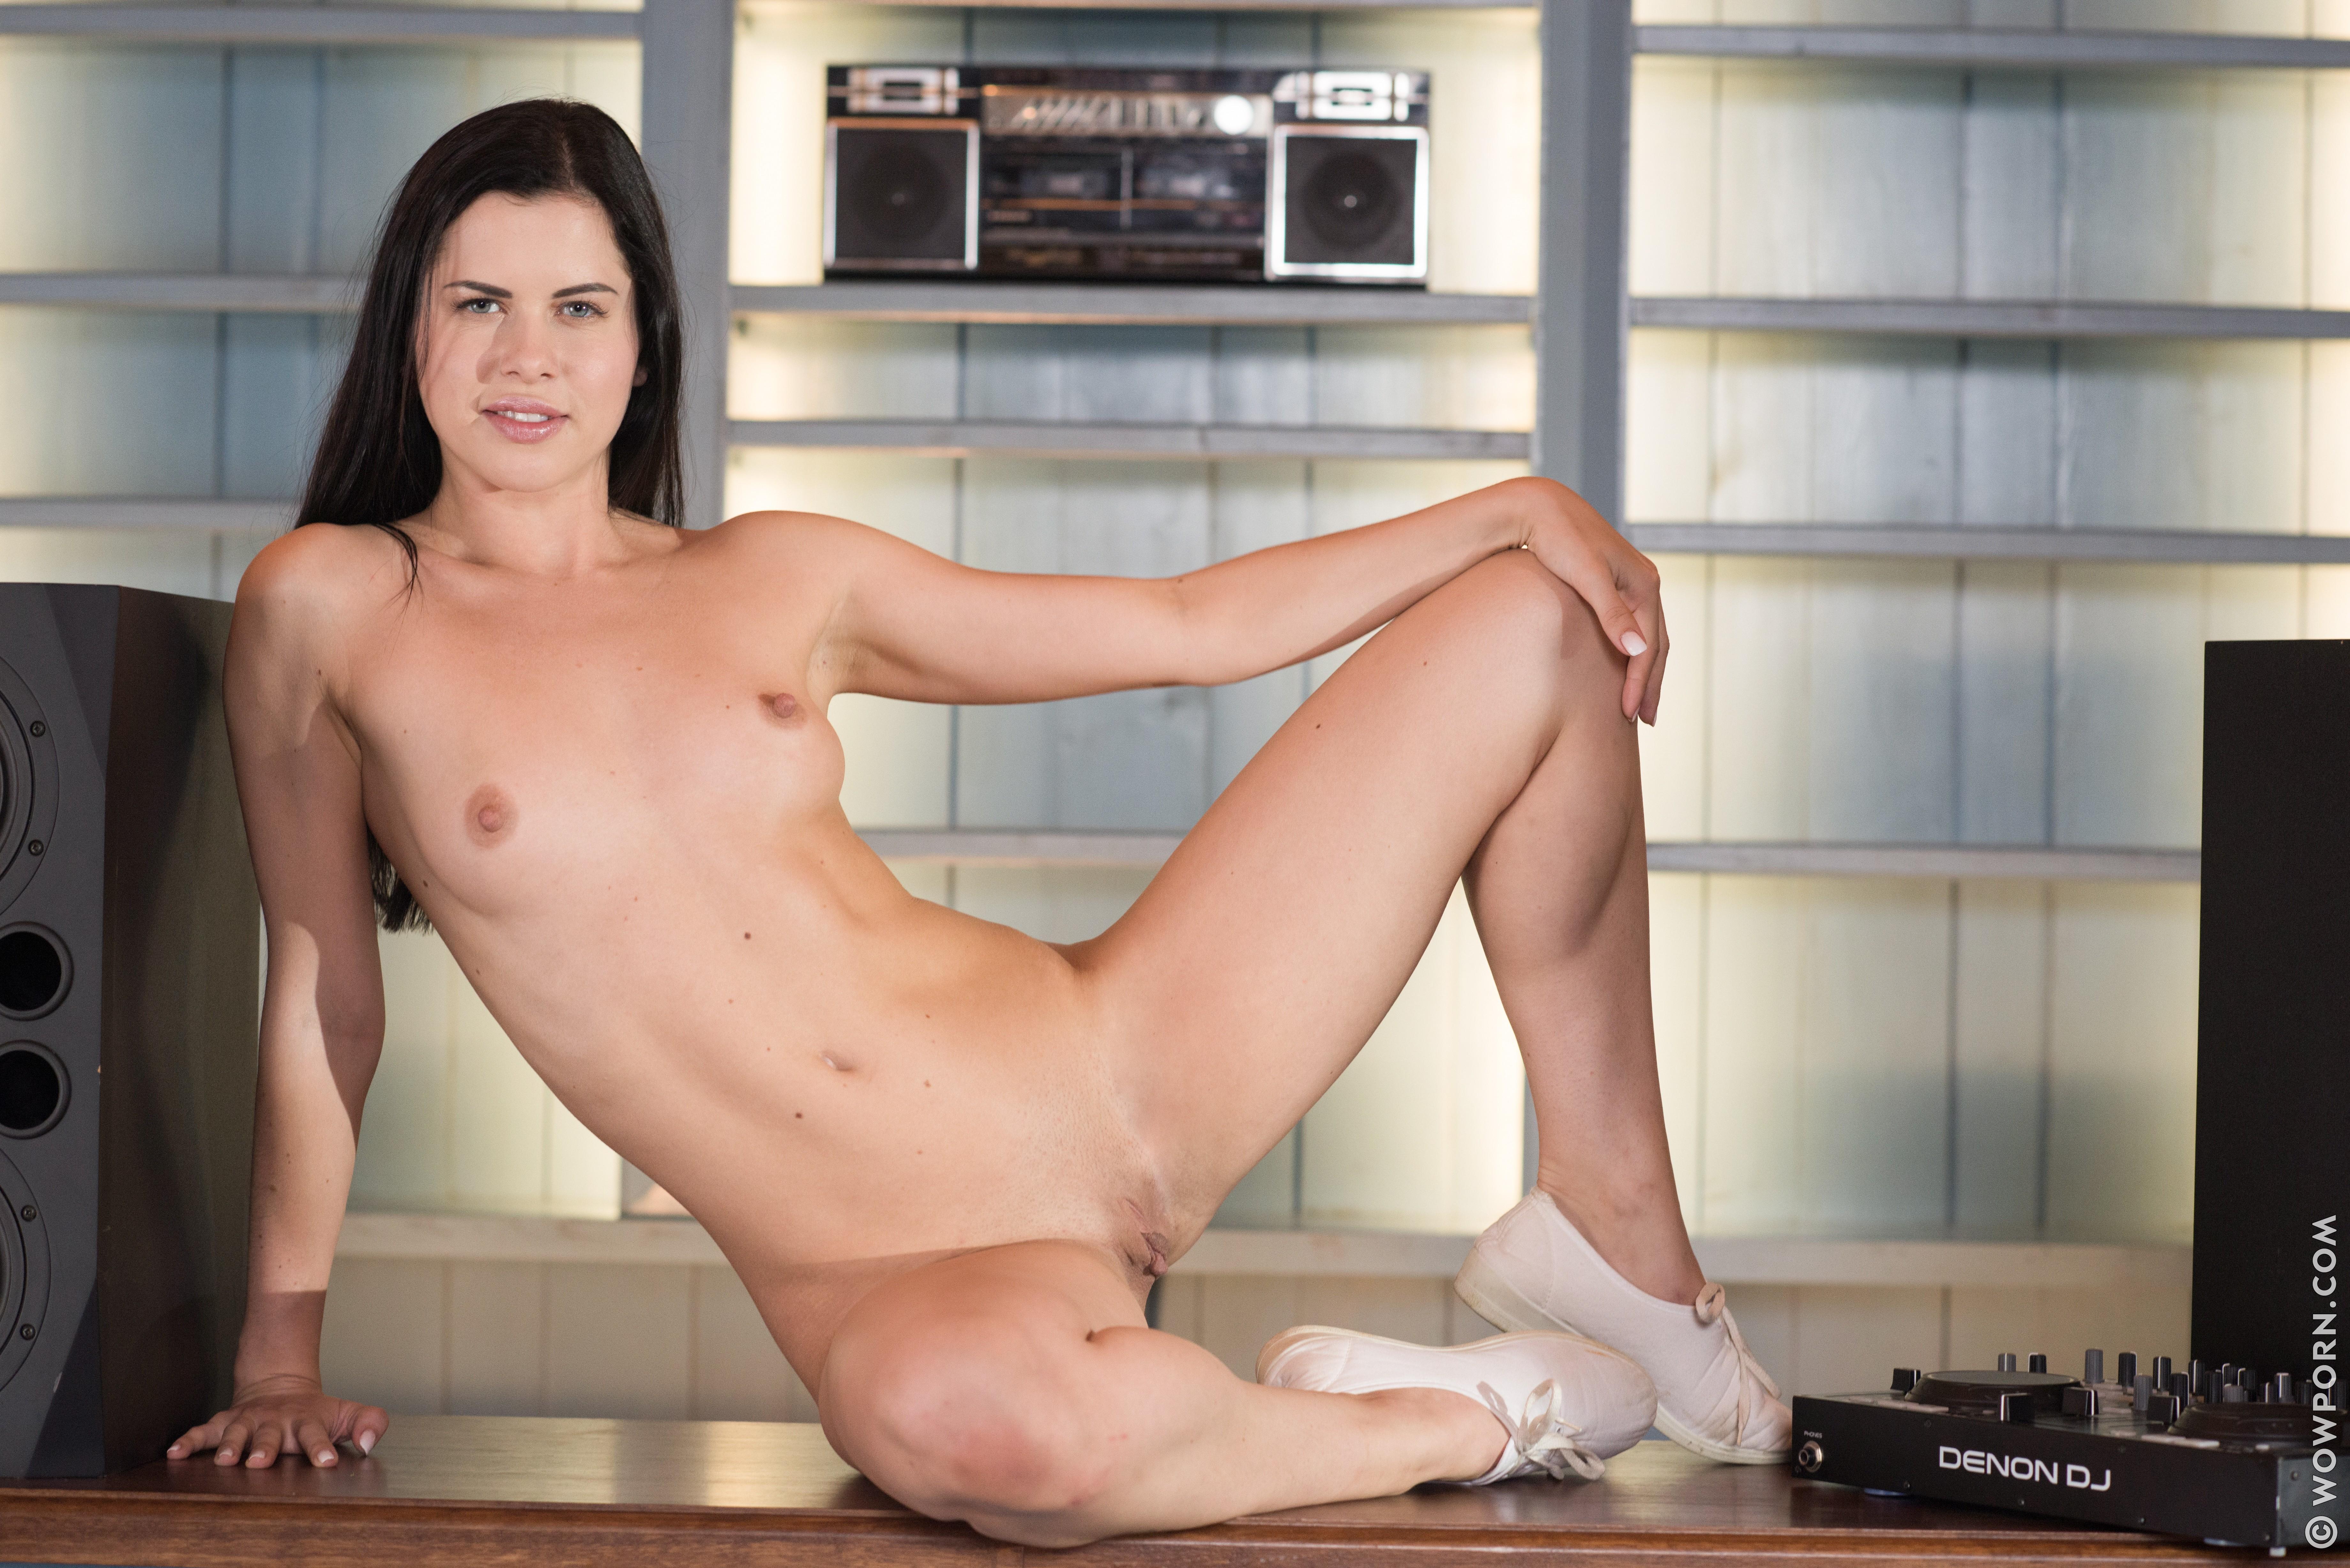 Sexy penthouse girls naked